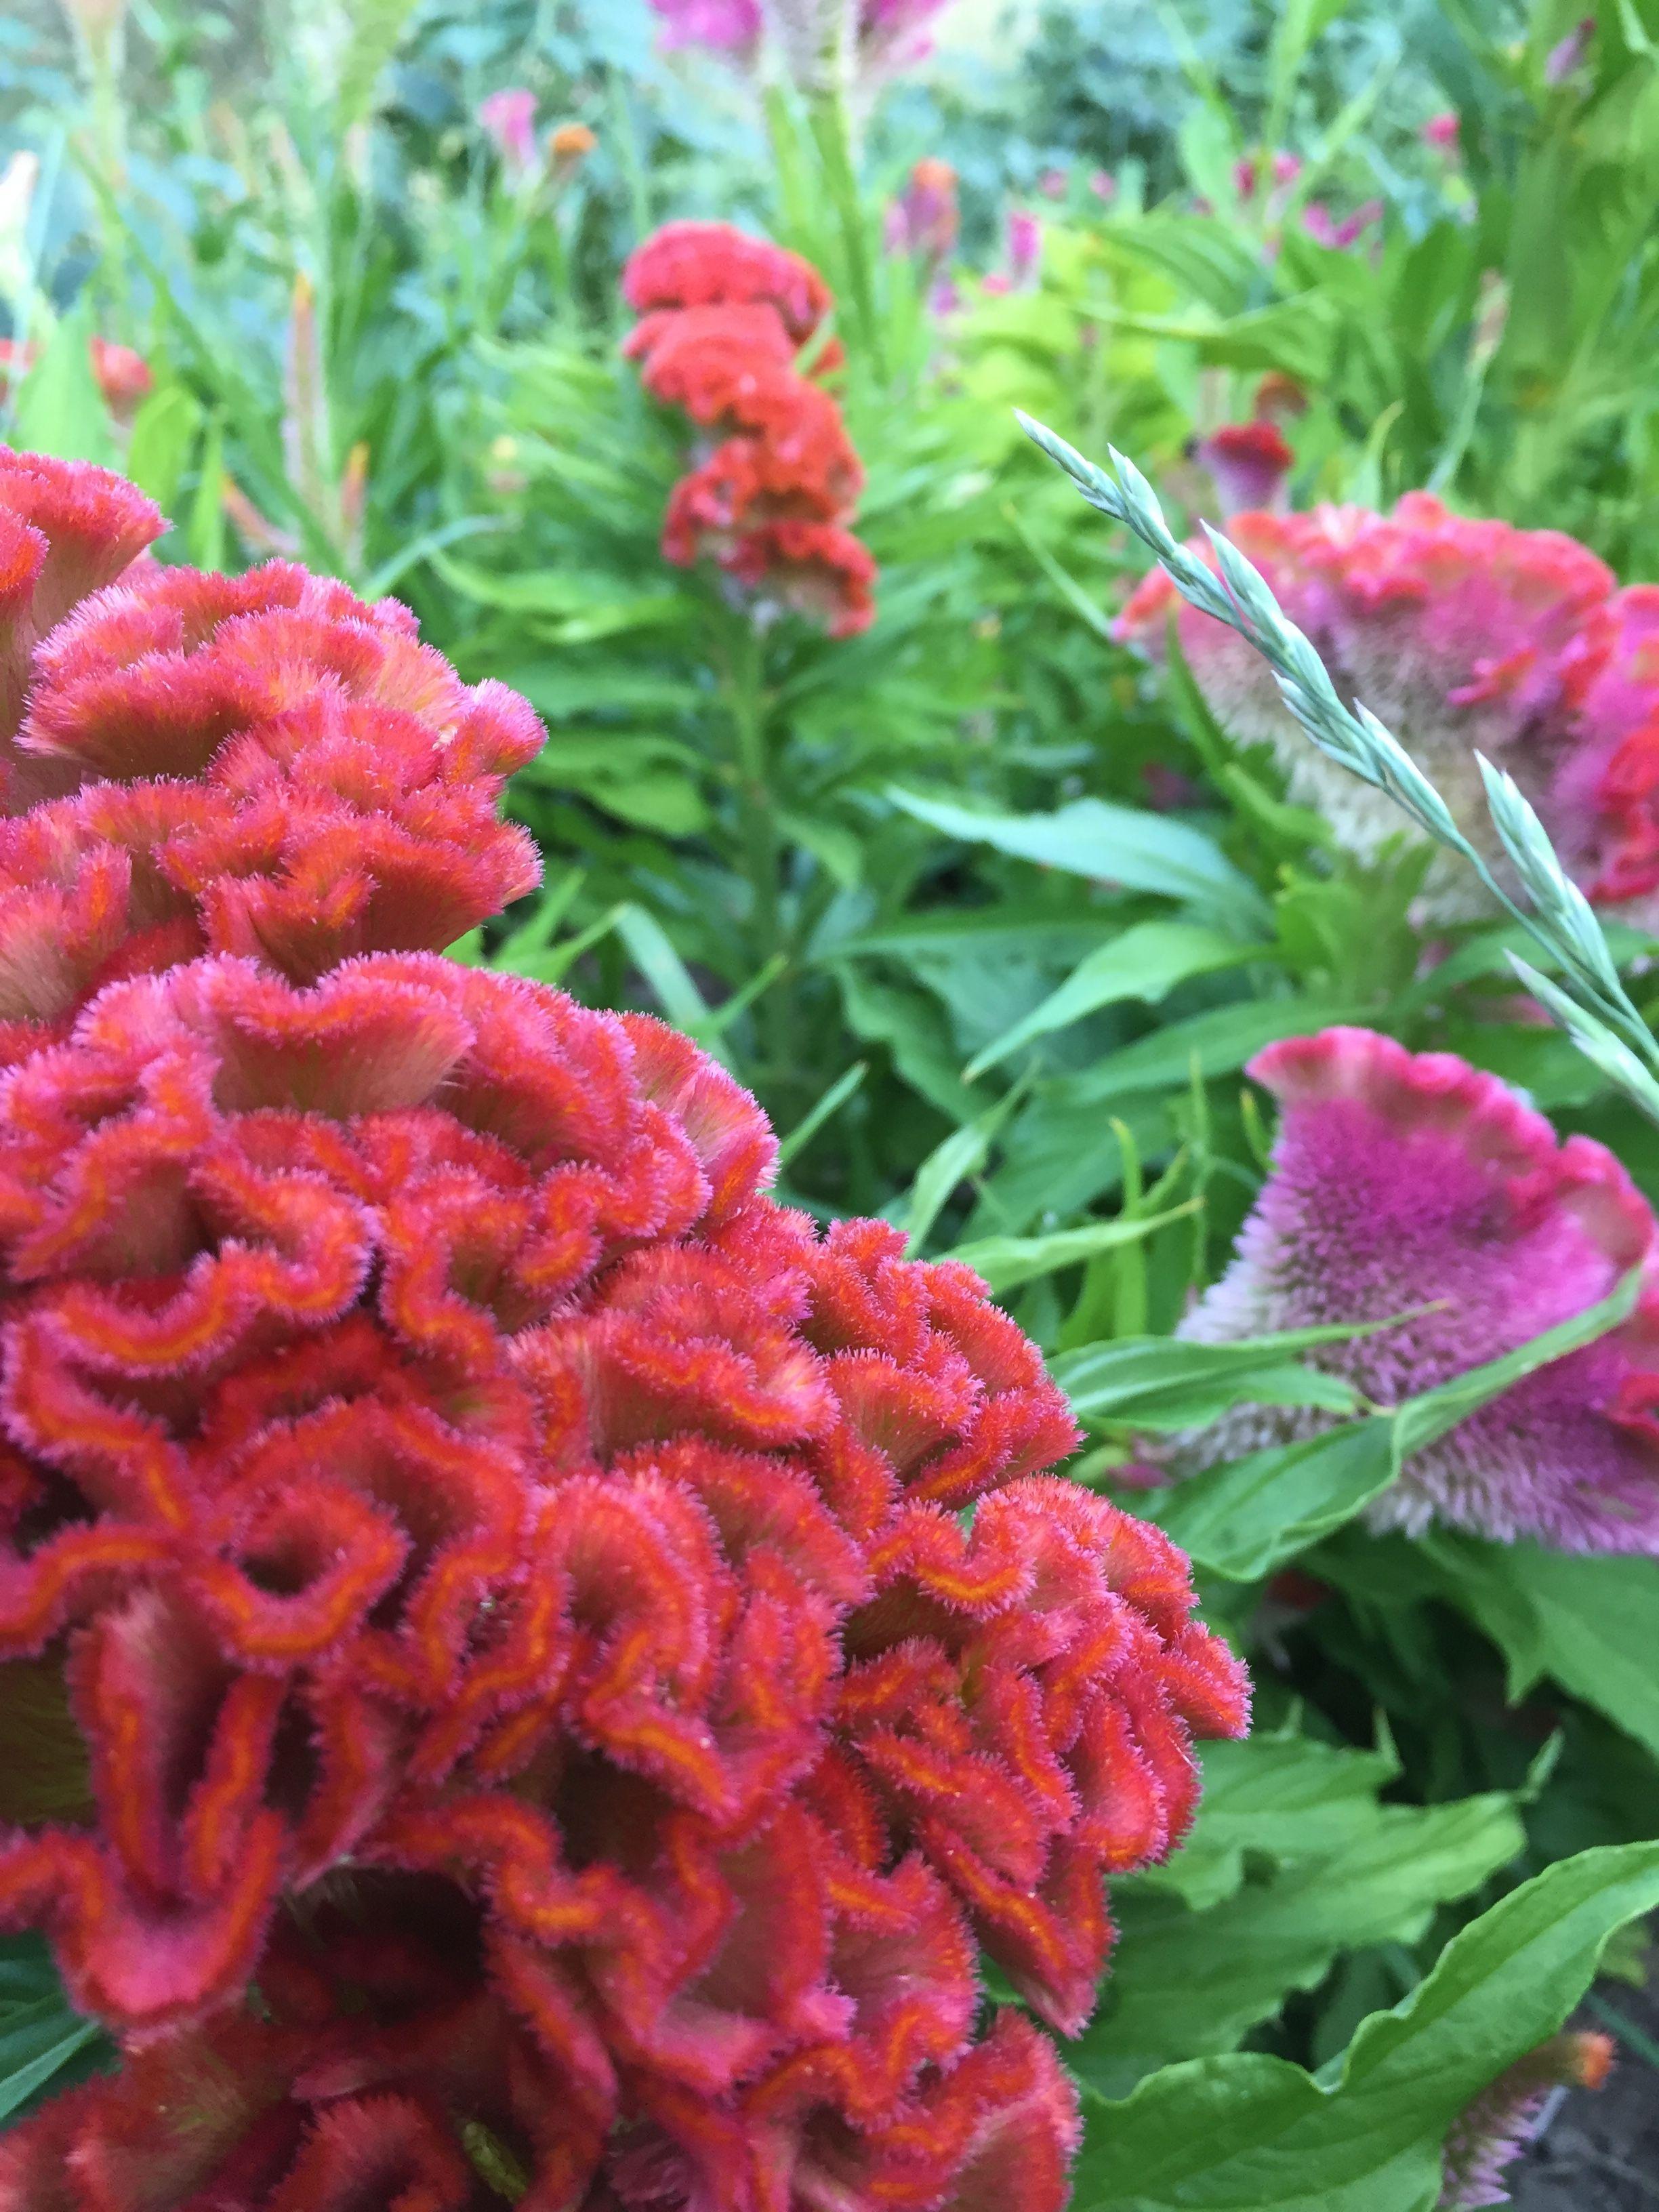 Celosia Cristata July Flowers August Flowers Everlasting Flowers